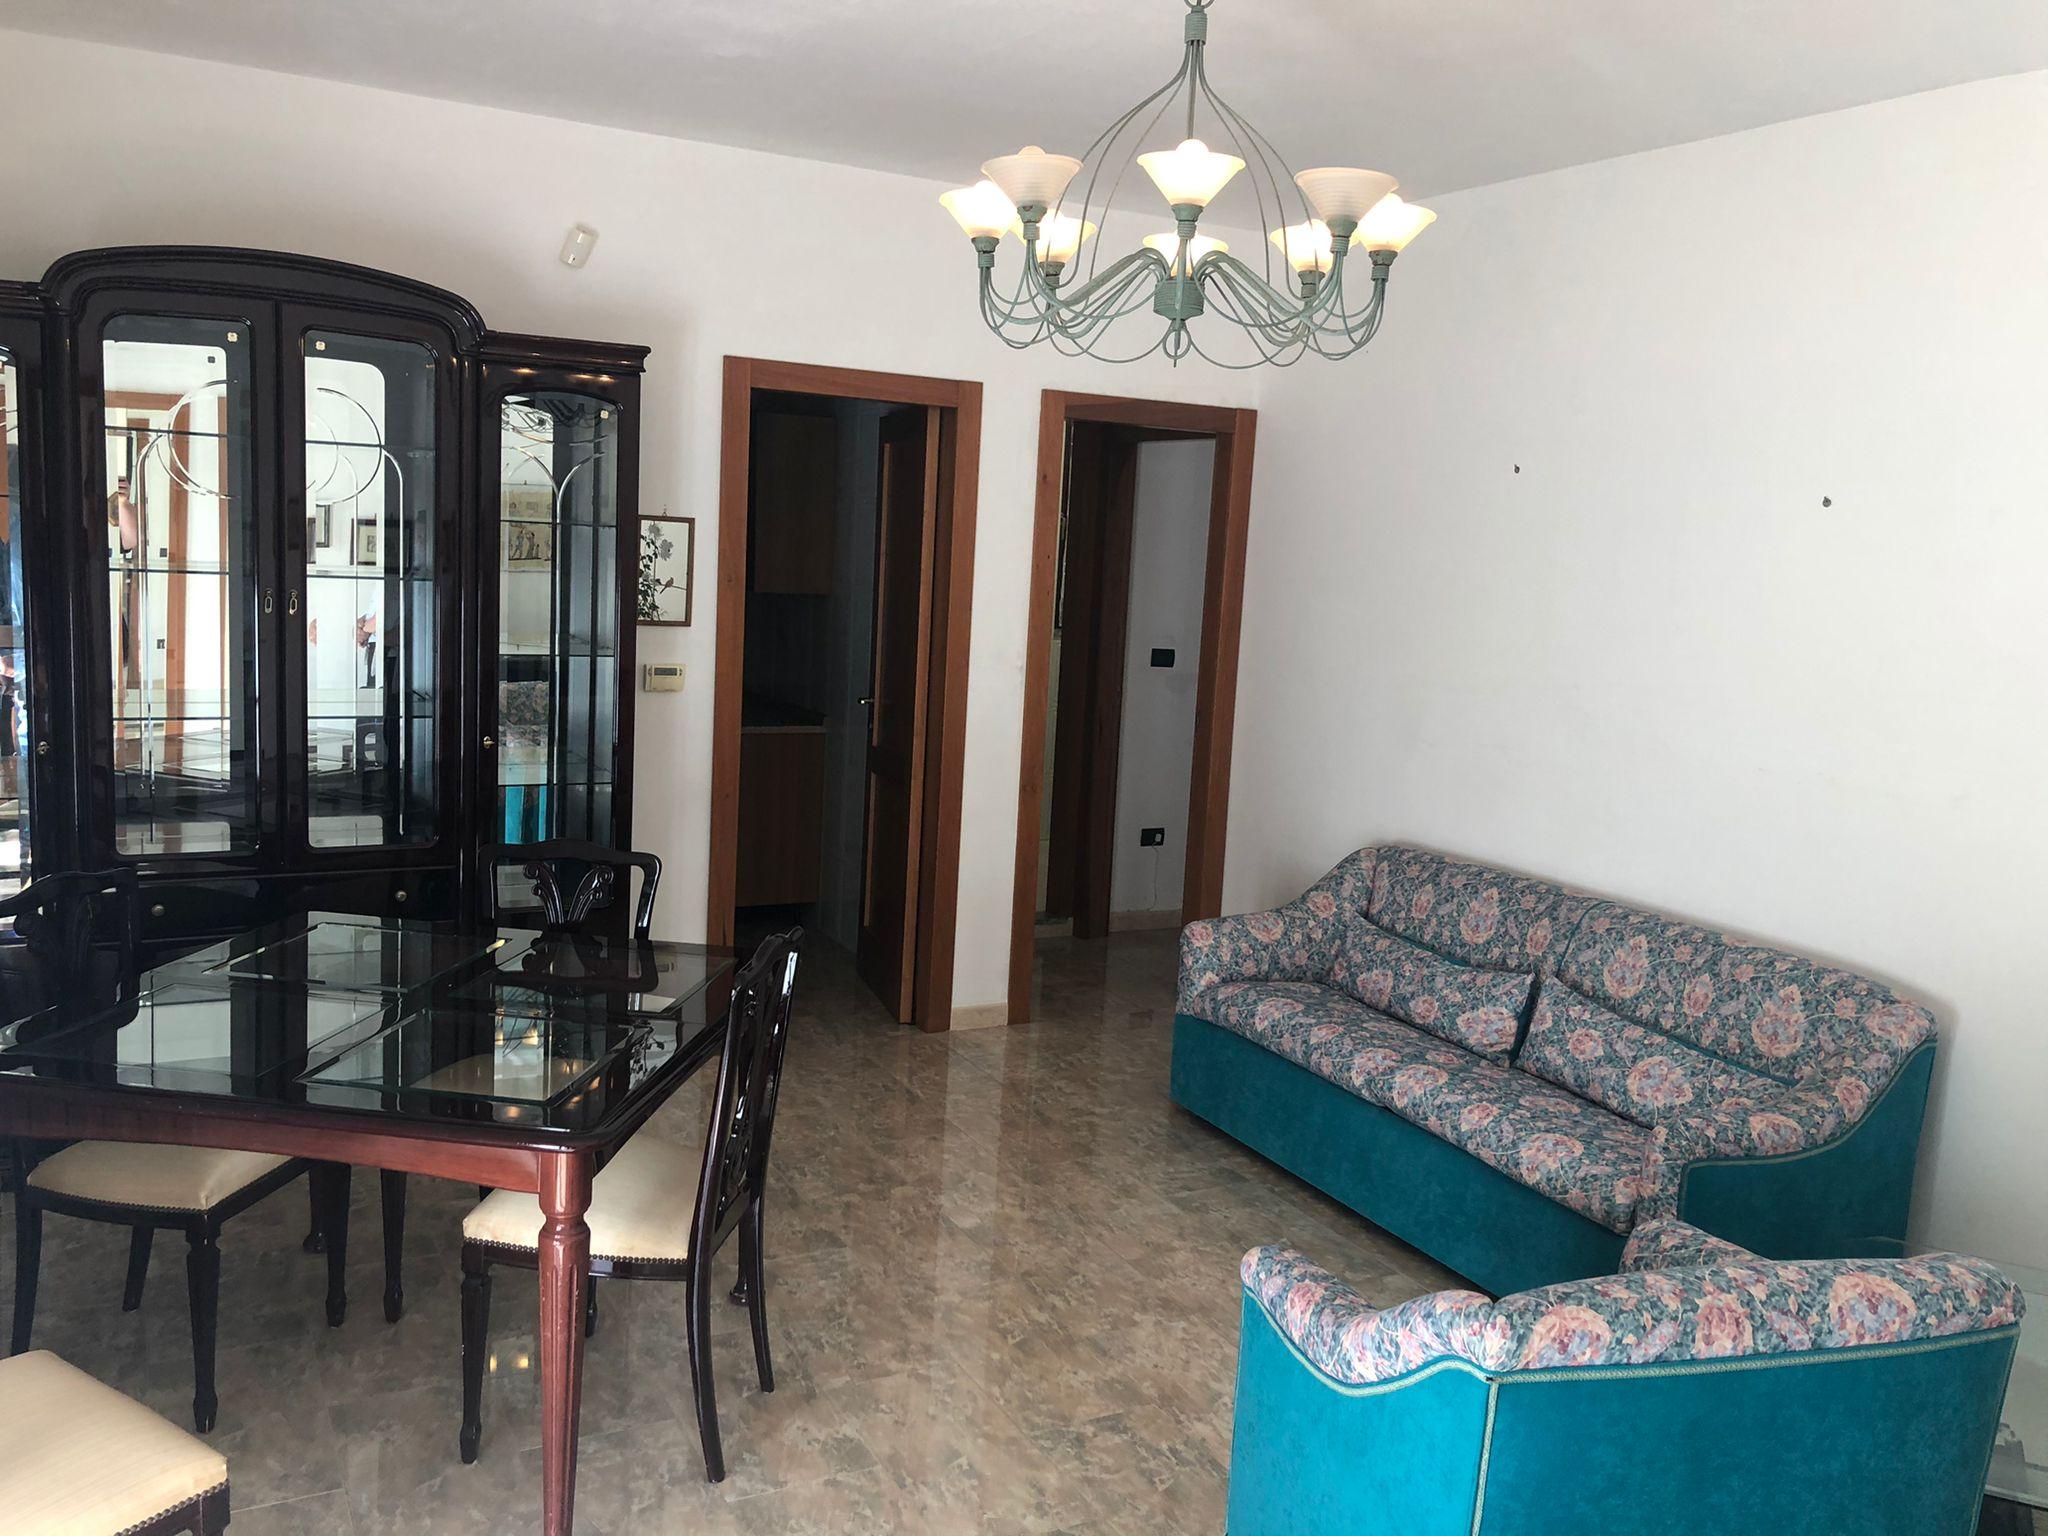 aam 669 Trivano a Casale/2 bedrooms Casale to Rent